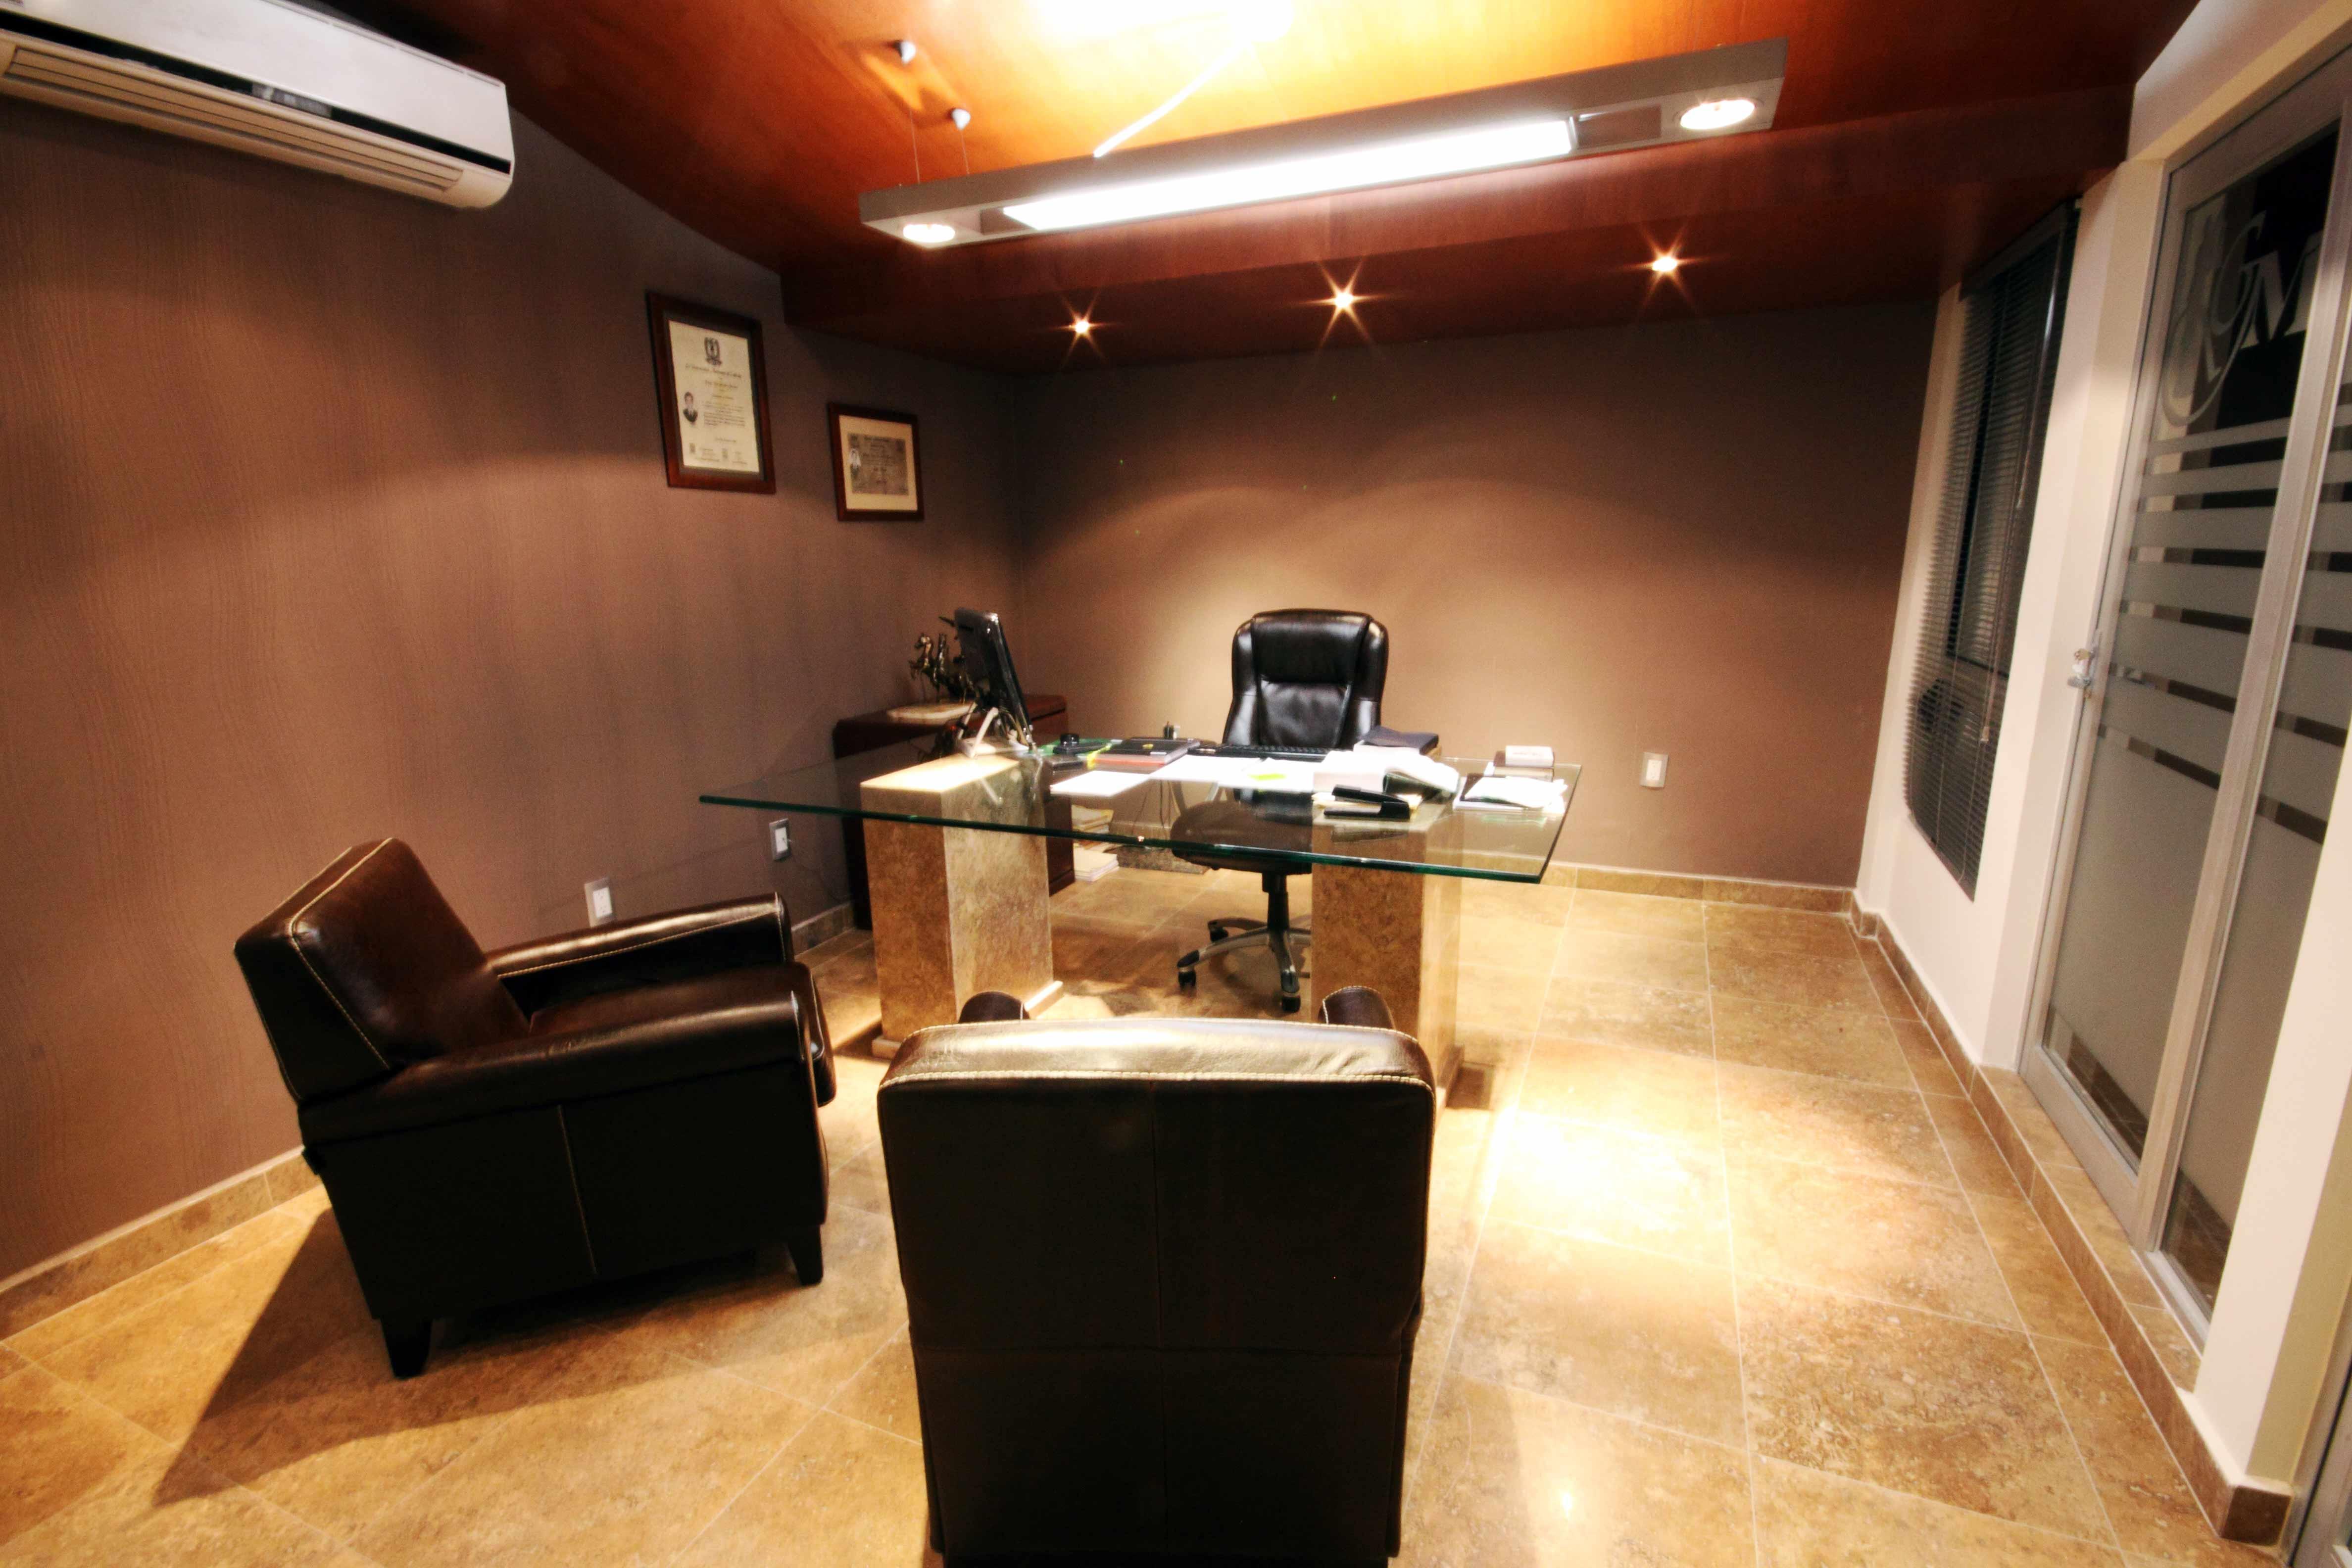 oficinas gonzalez martinez abogados by arquitectura dise o